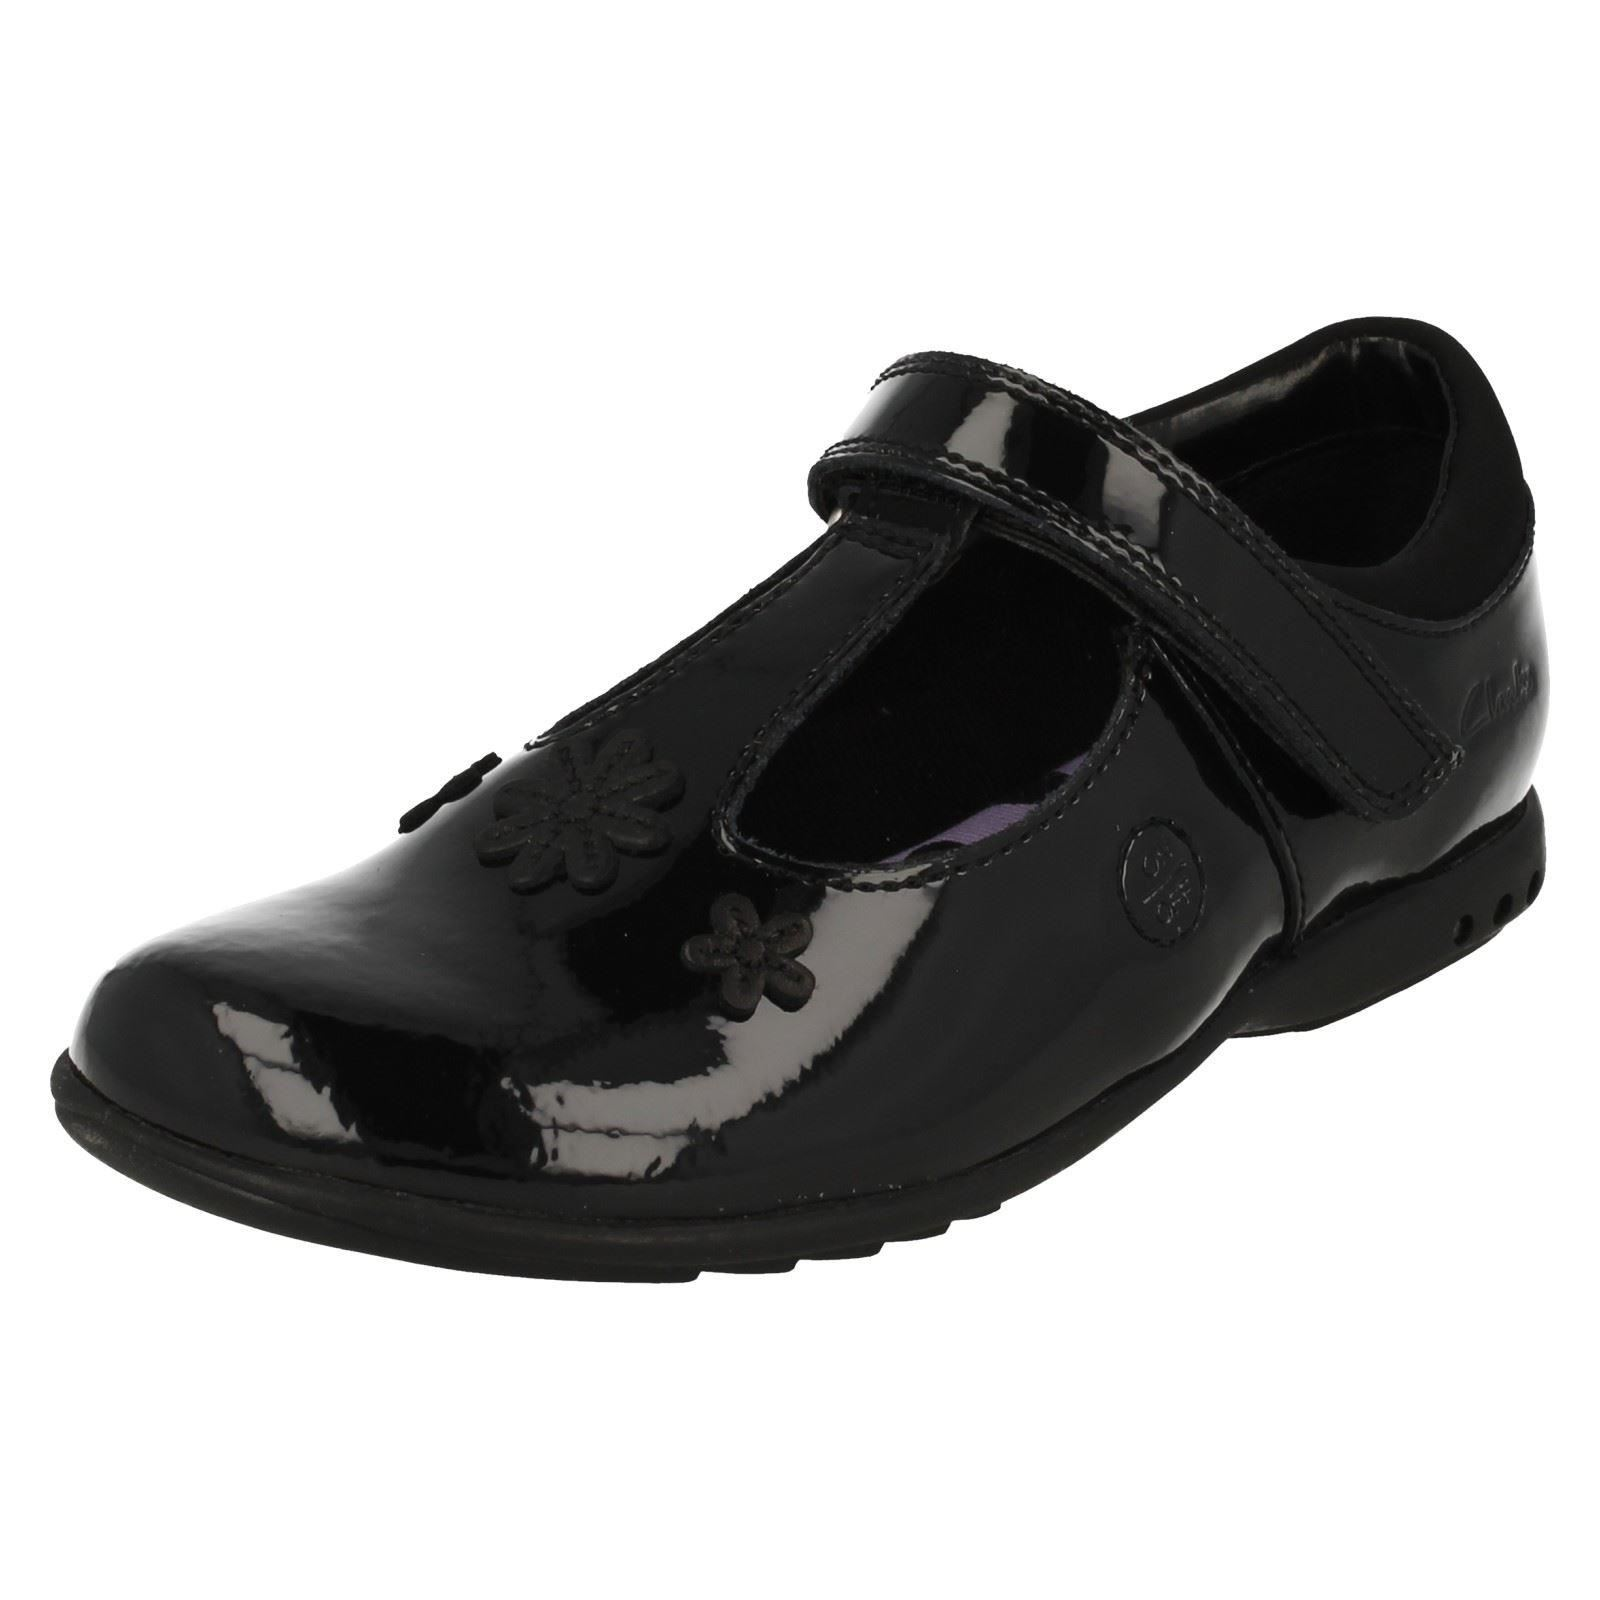 5d54372f27b Zapatos Clarks T-Bar inteligente escuela de infantil las niñas con luces  'Trixi Beau'